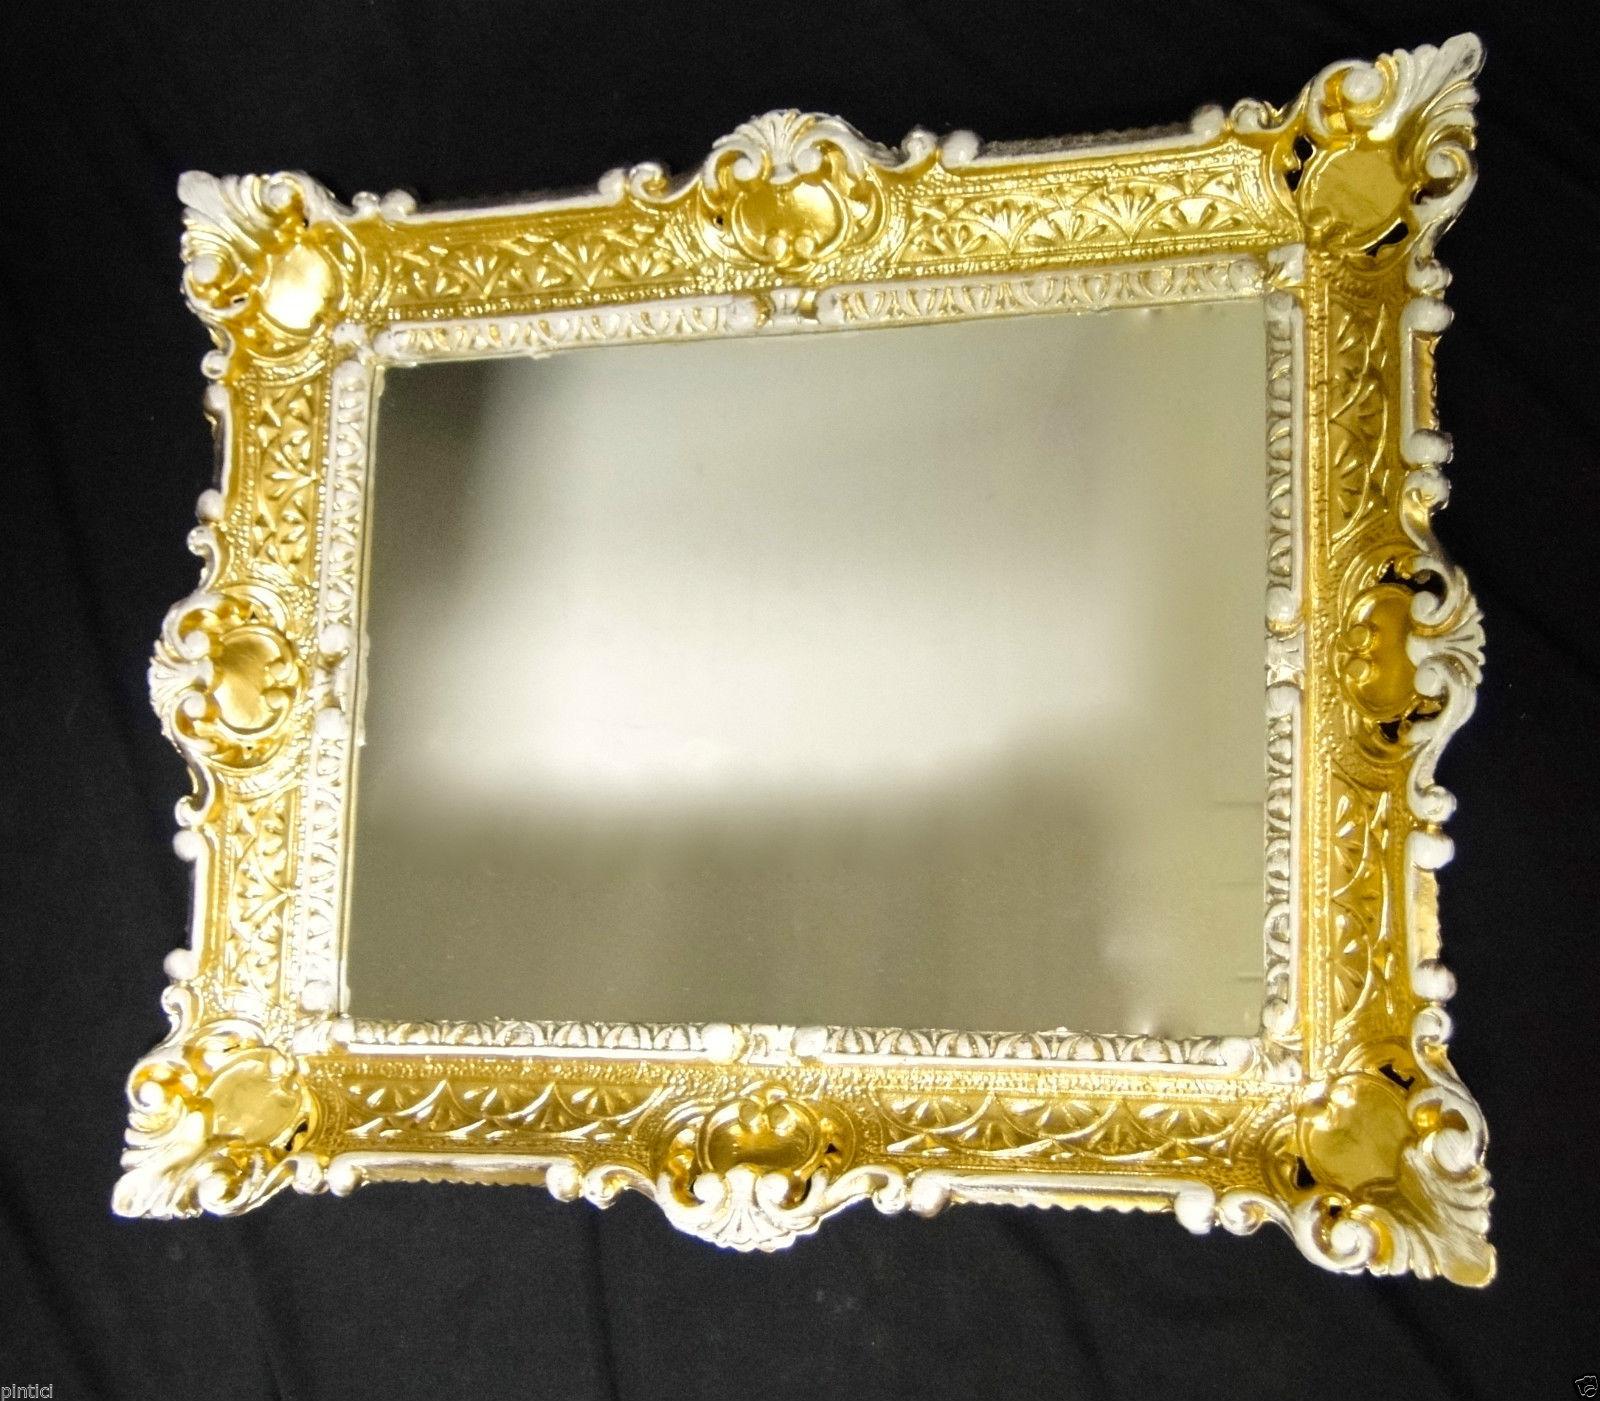 wandspiegel gold wei antik spiegel barock 57x47 bad spiegel rechteckig 39 49 kaufen bei pintici. Black Bedroom Furniture Sets. Home Design Ideas